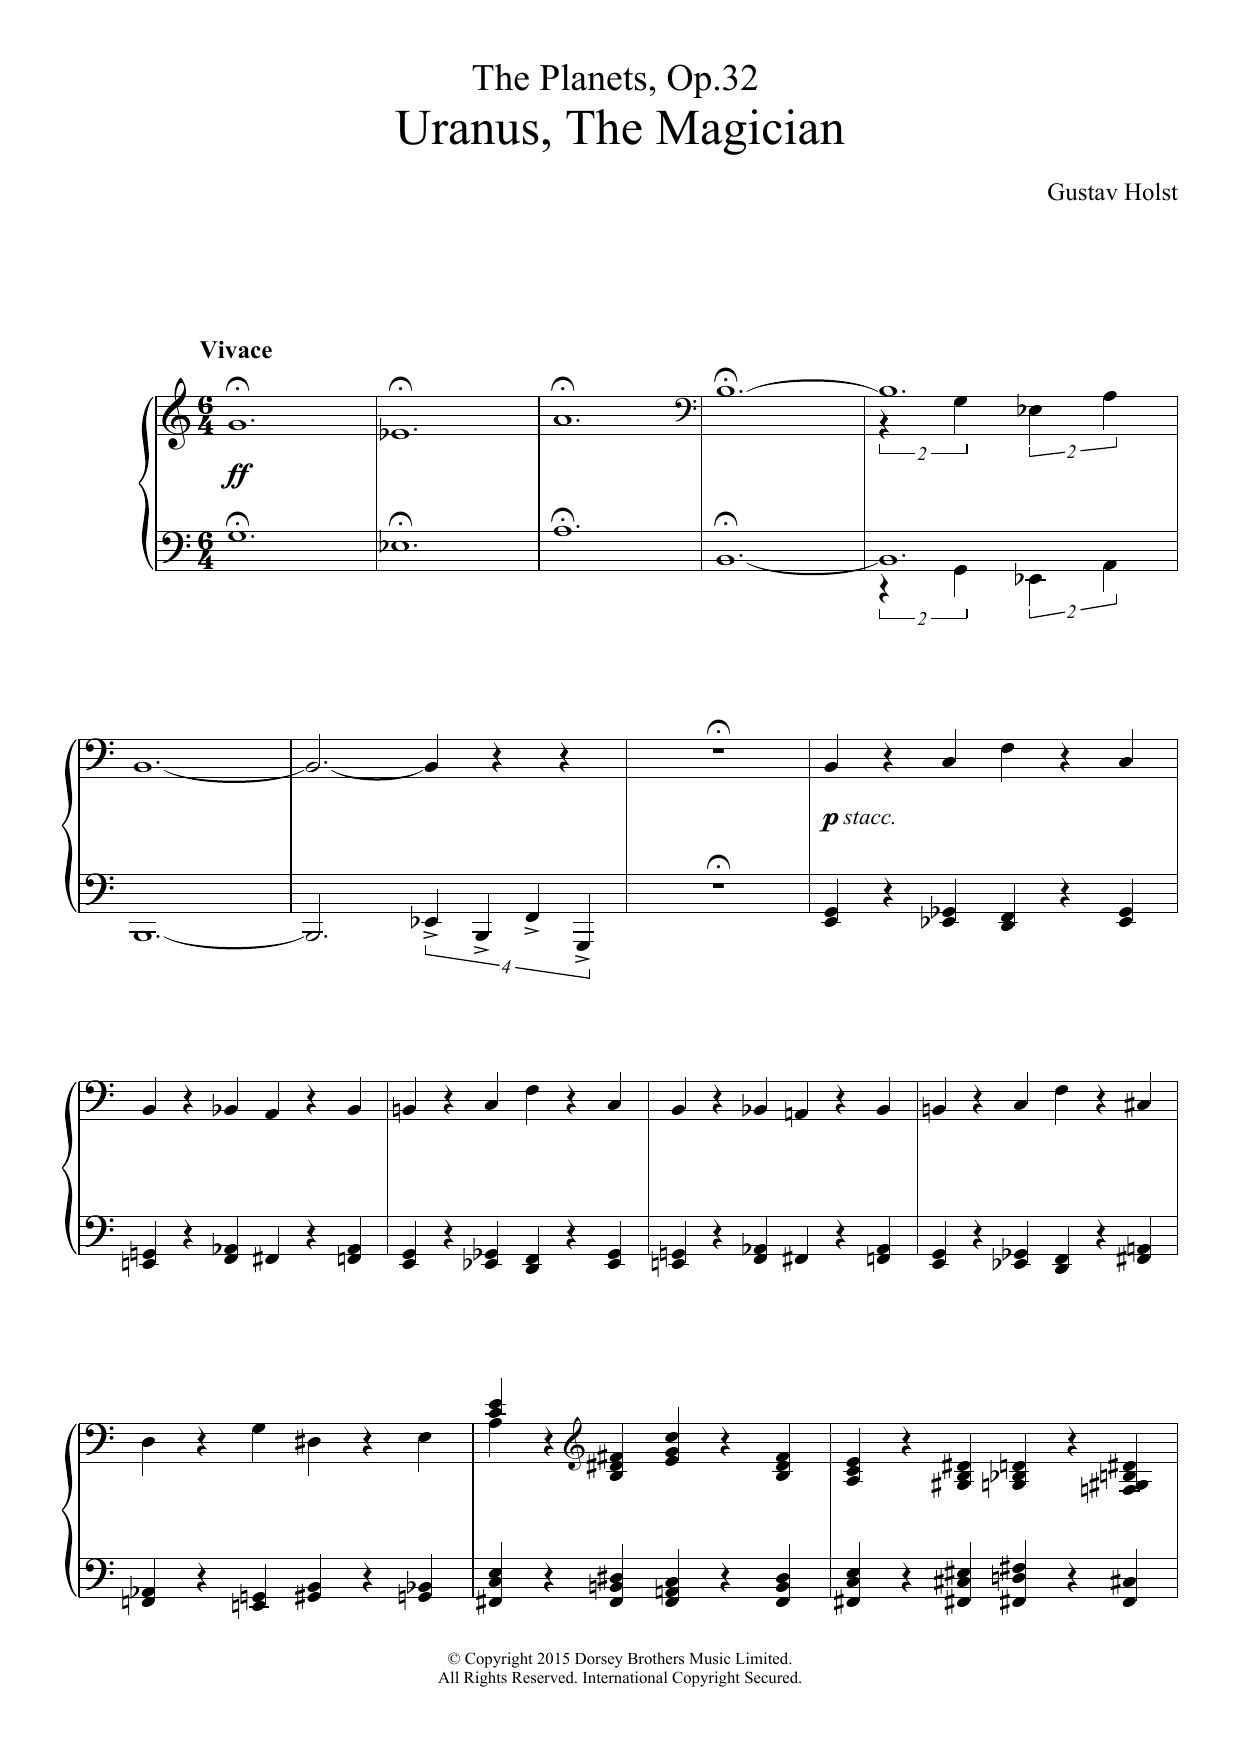 The Planets, Op. 32 - Uranus, The Magician Sheet Music